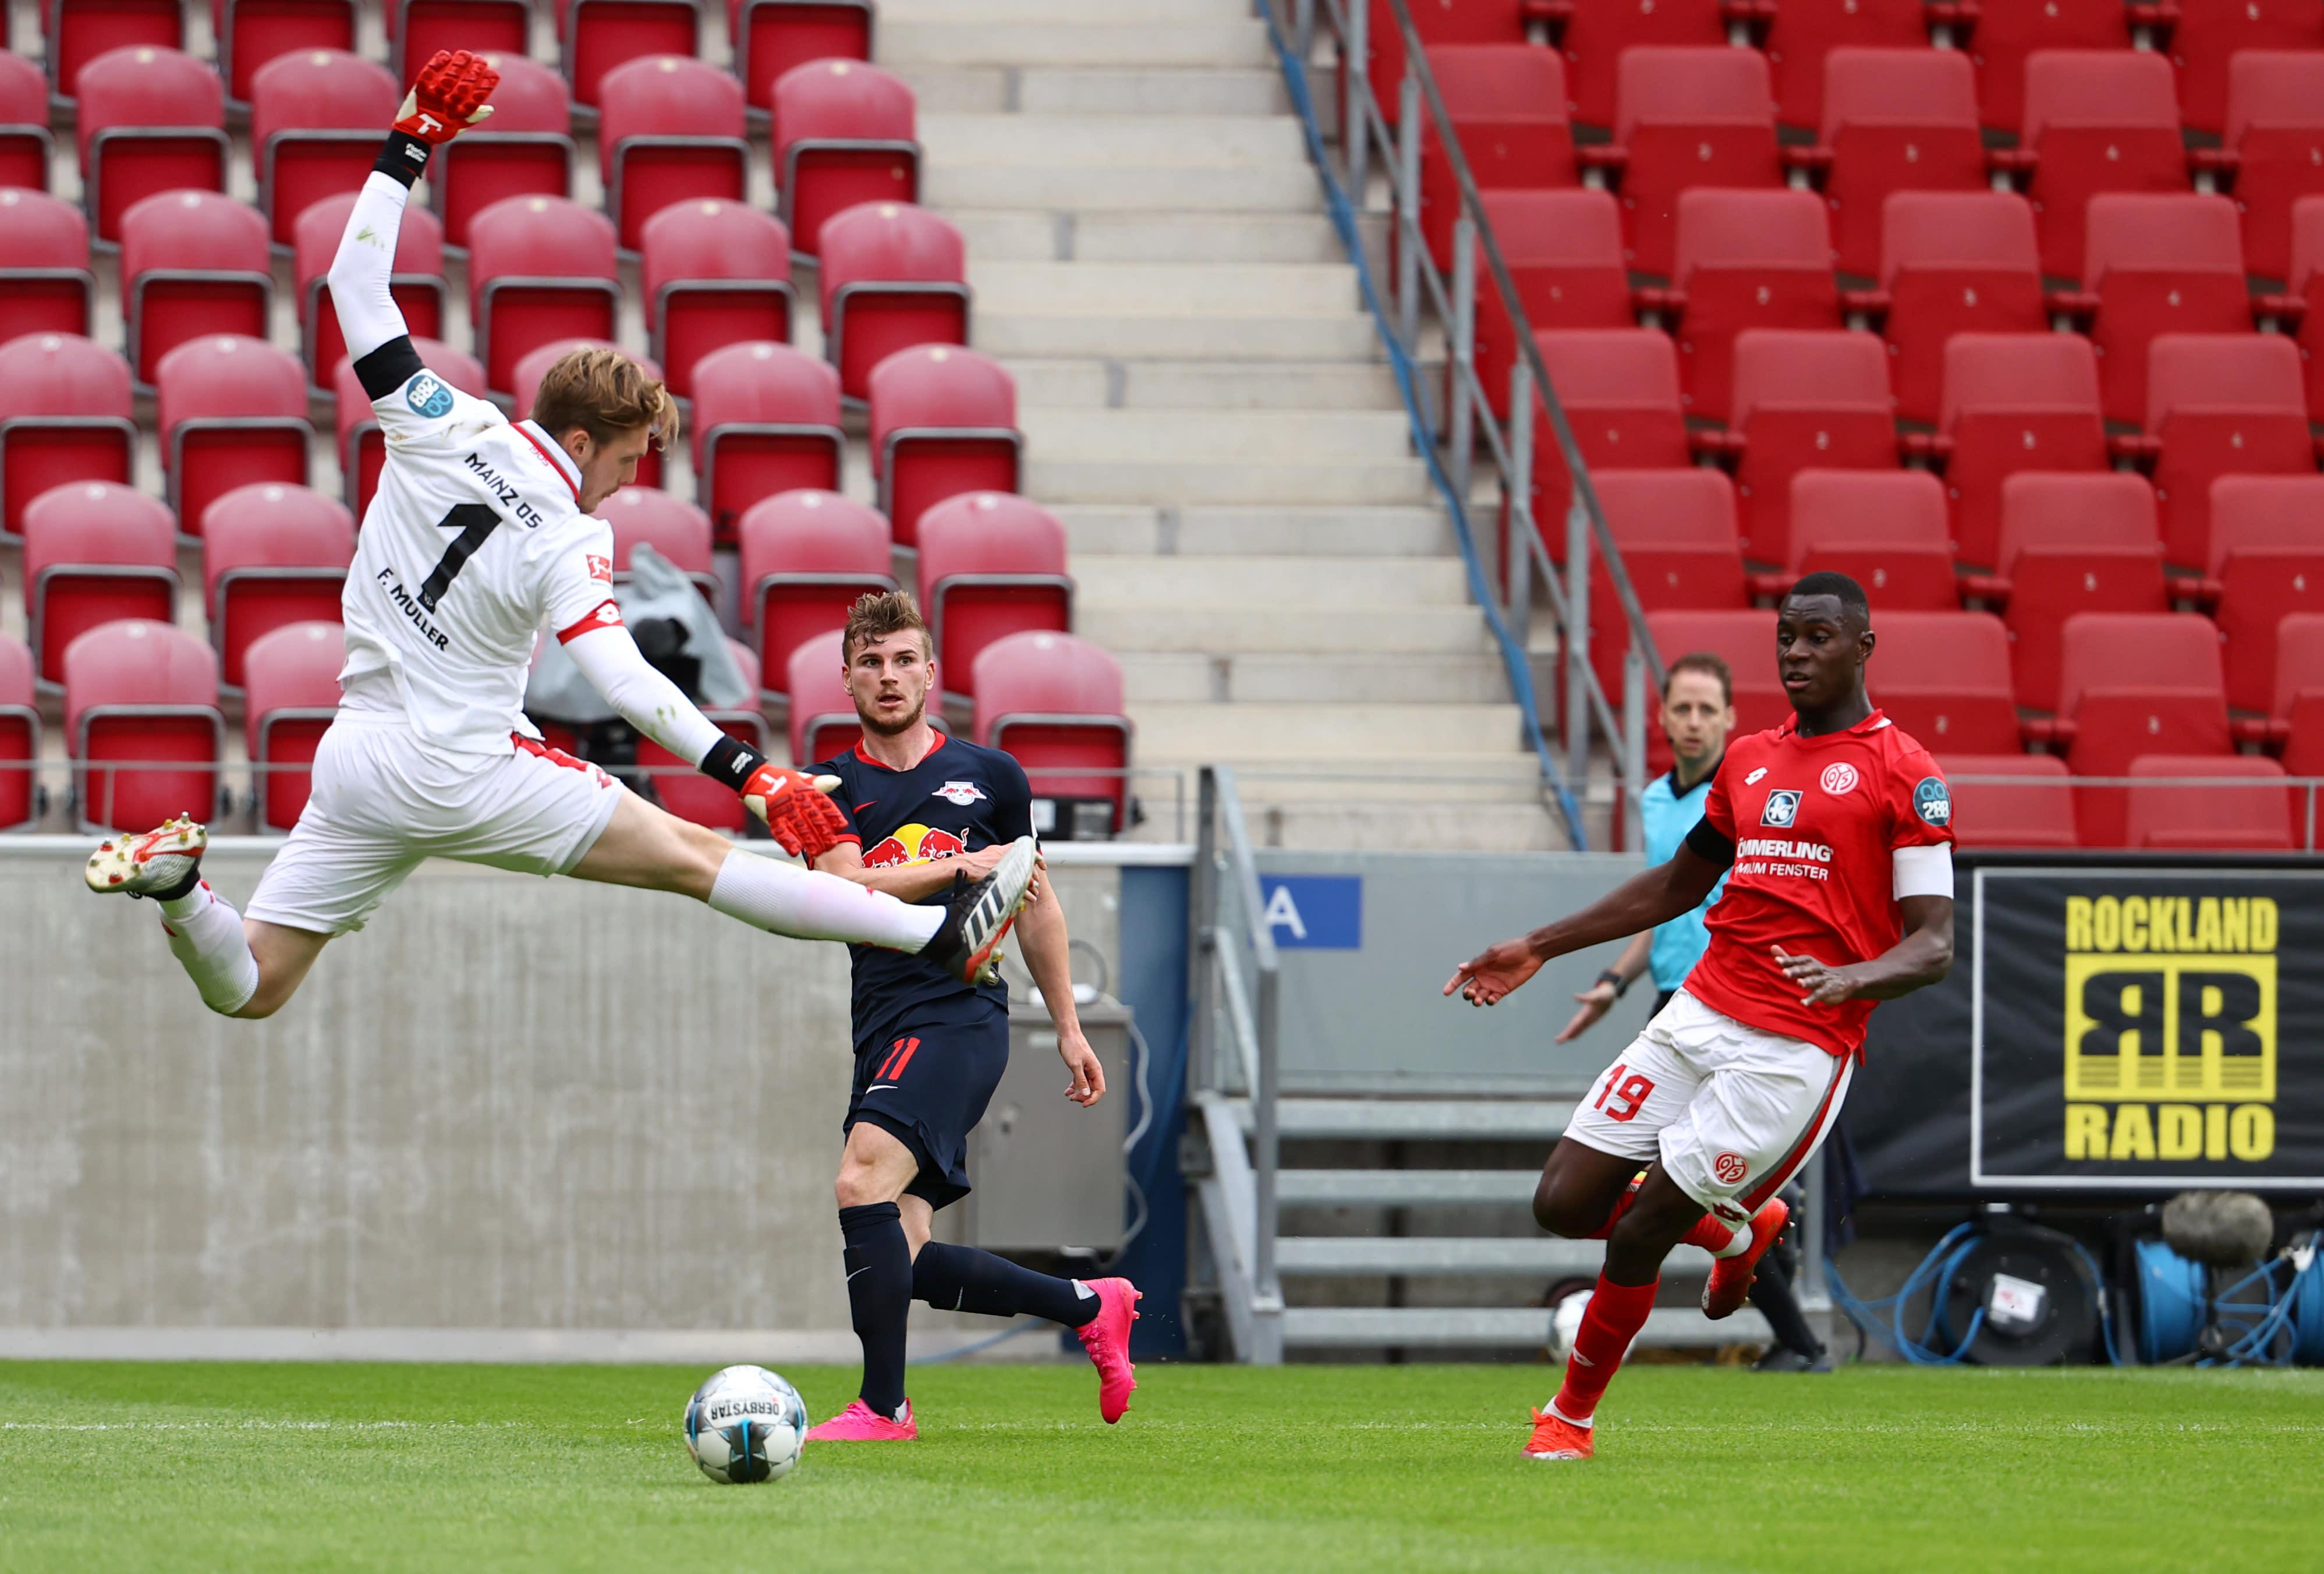 Bundesliga Rb Leipzig Sweeps Mainz 13 0 Could Challenge For Title